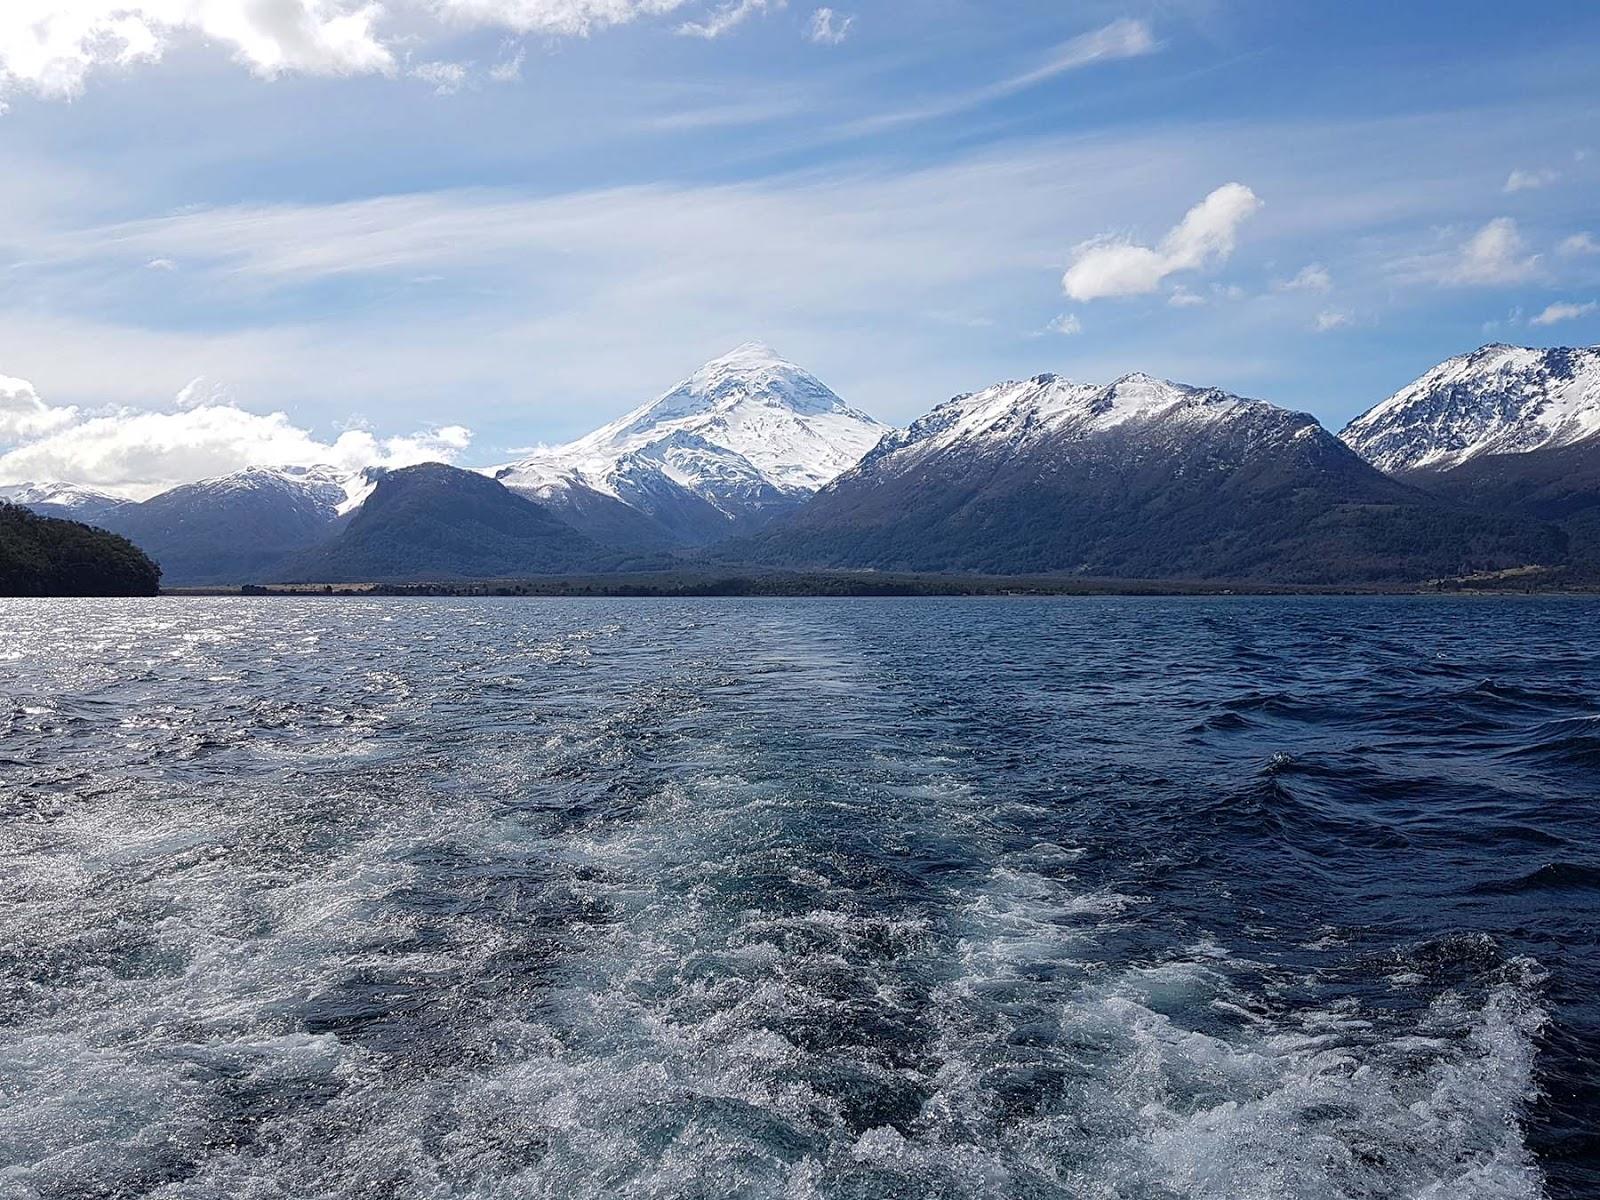 Vulcão Lanin, Lago Huechulafquen, Patagônia Argentina